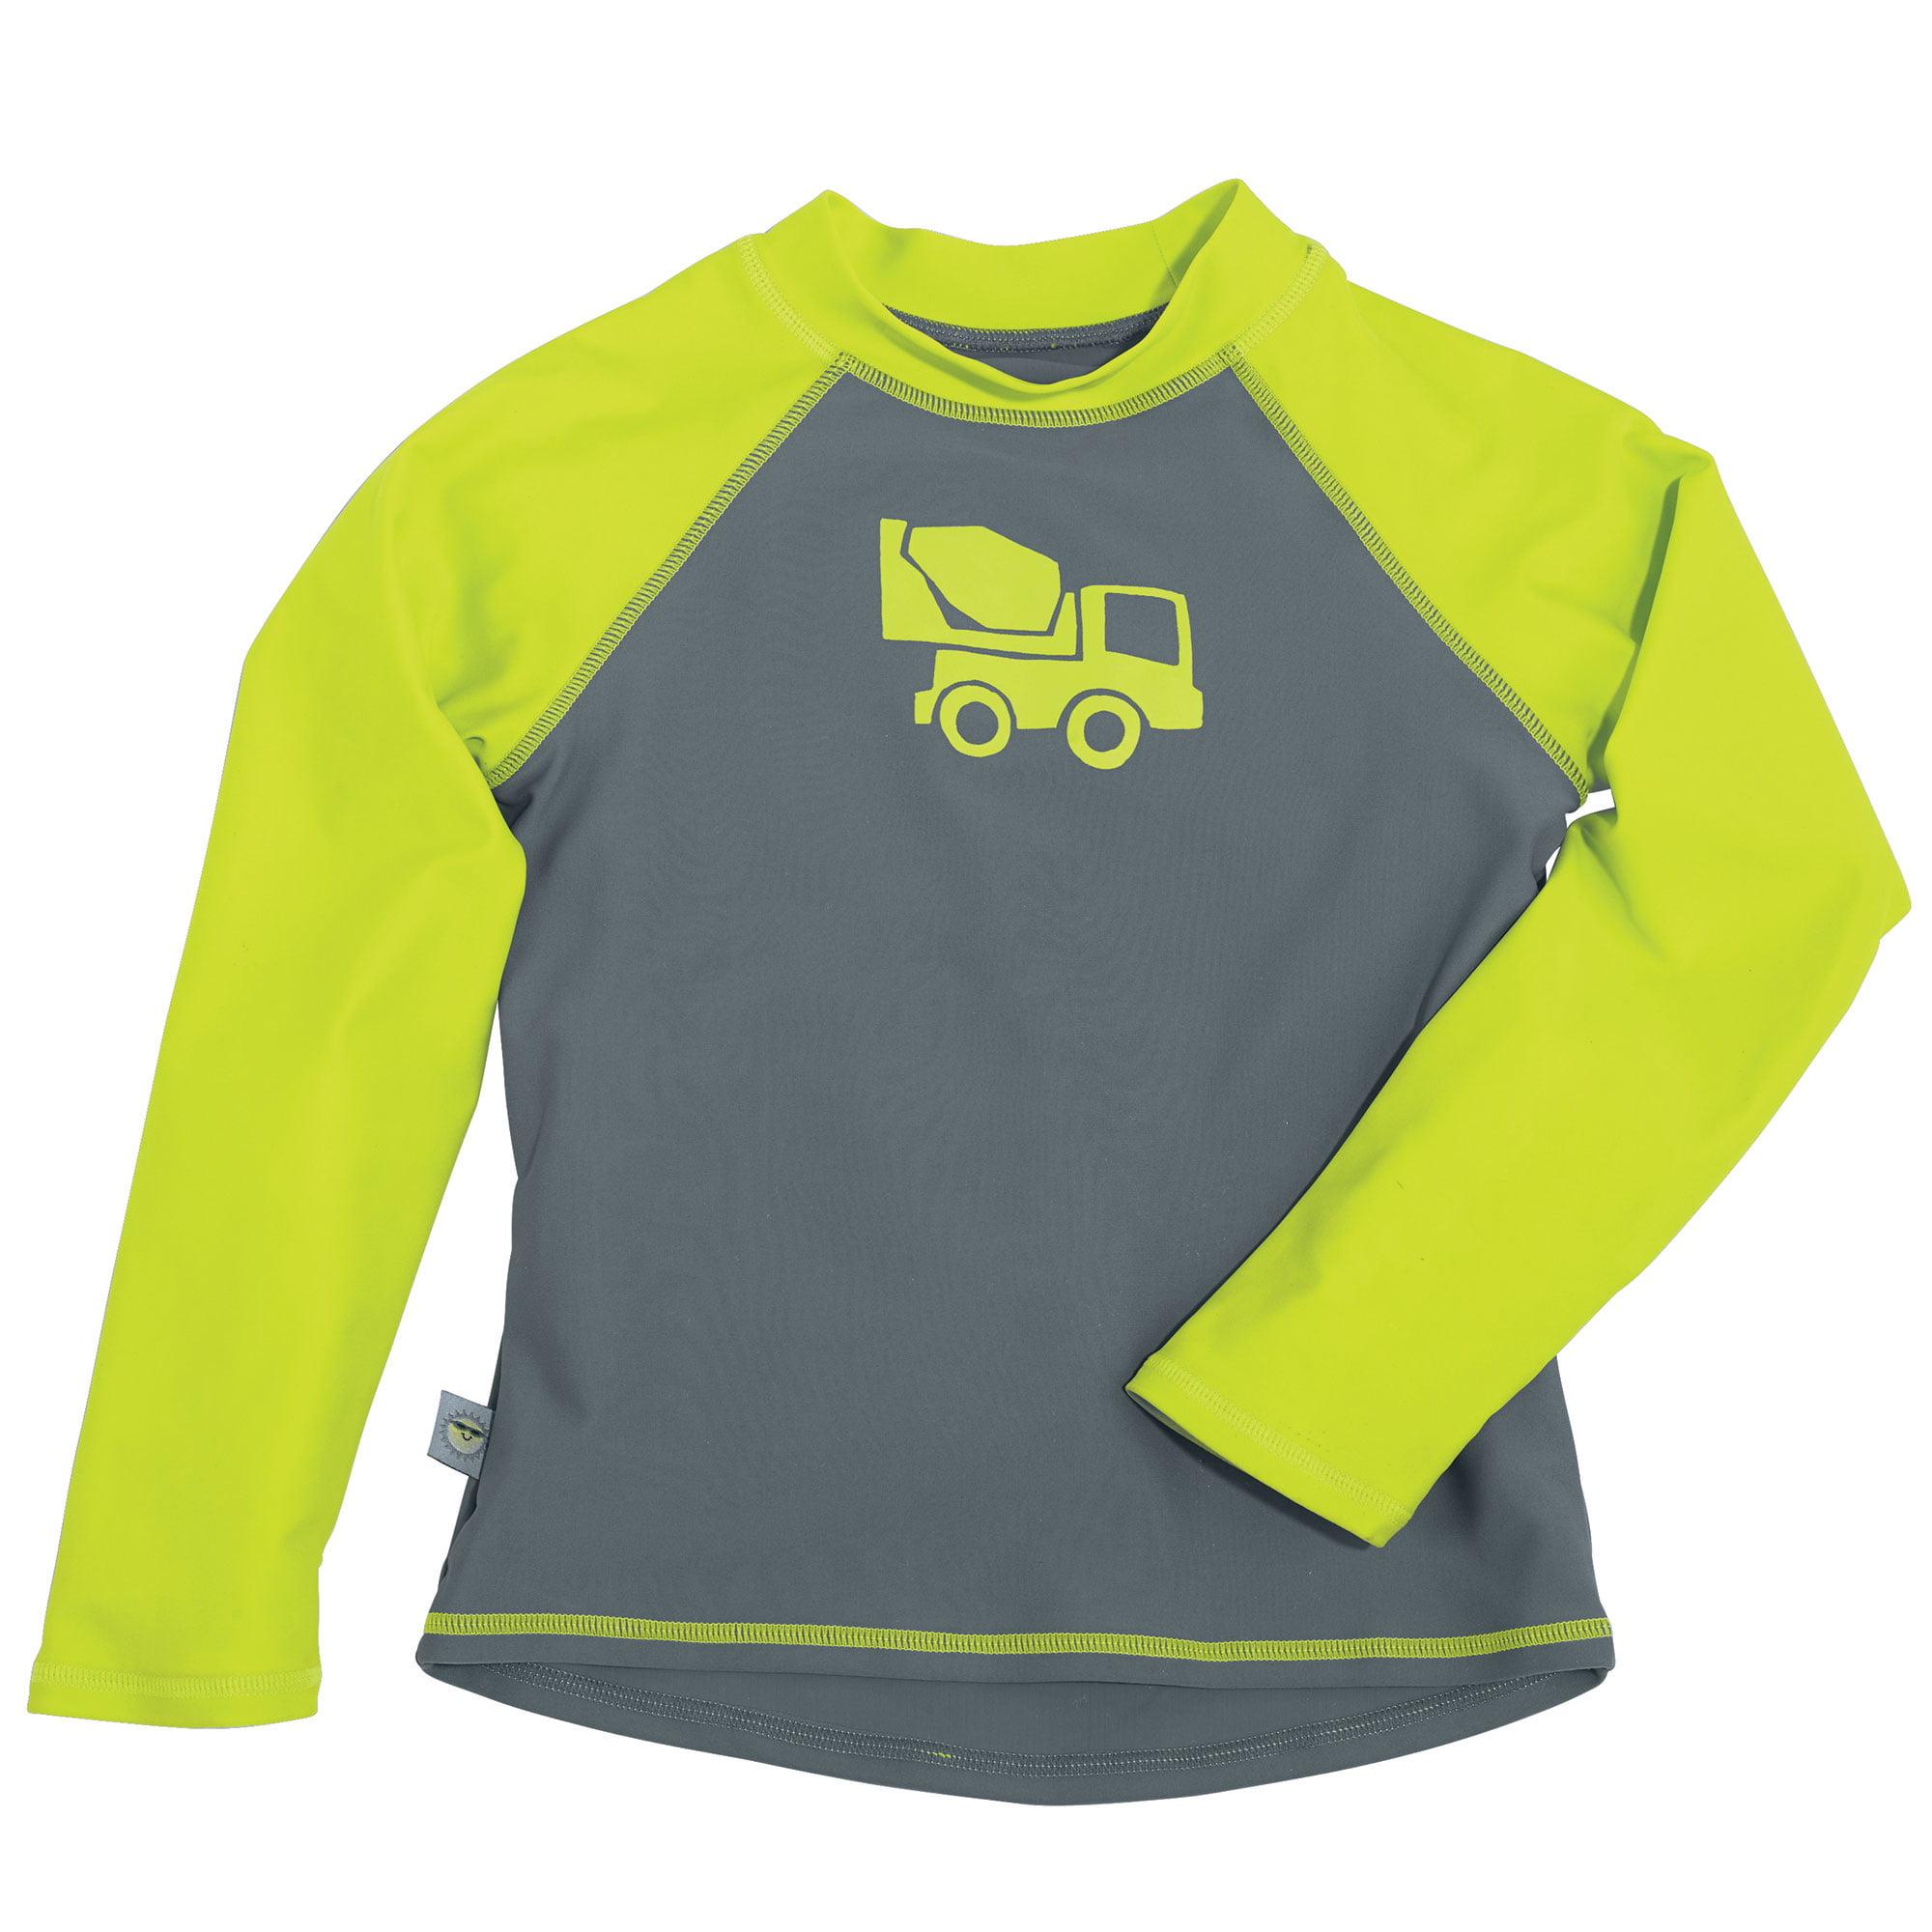 Sun Smarties Boy Rashguard - Grey and Green Truck - Long Sleeve